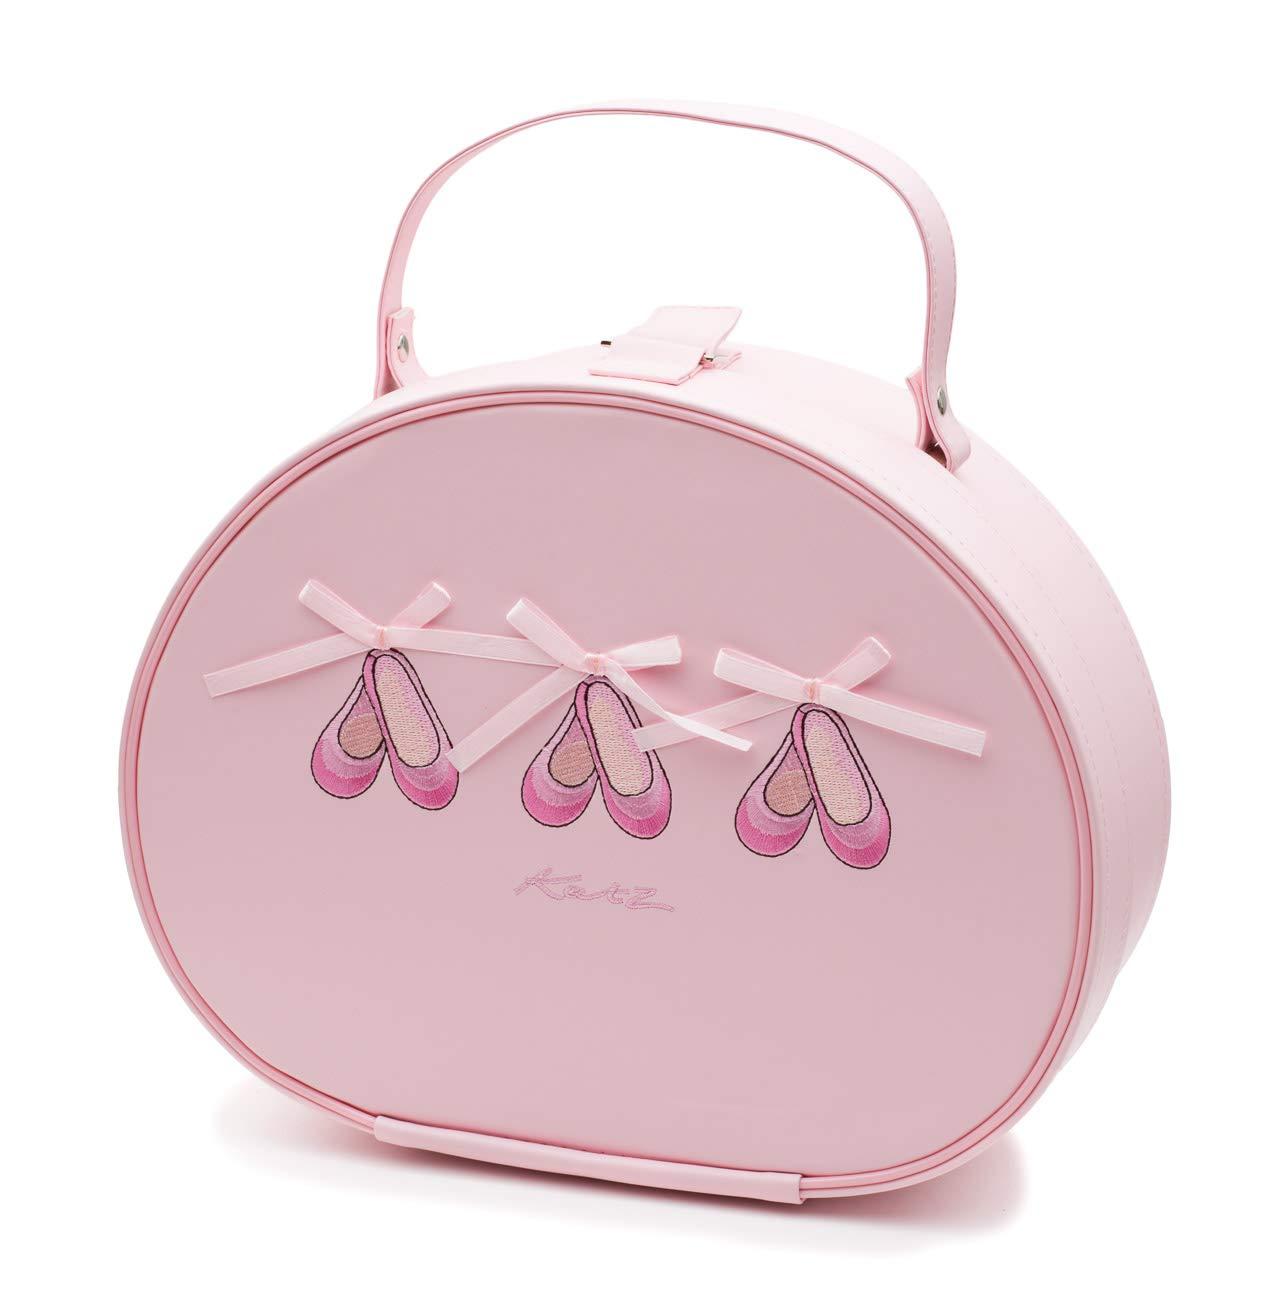 Katz Dancewear Girls Ballet Dance Pink Ballet Shoes Dance Bag Case KB103 Christmas